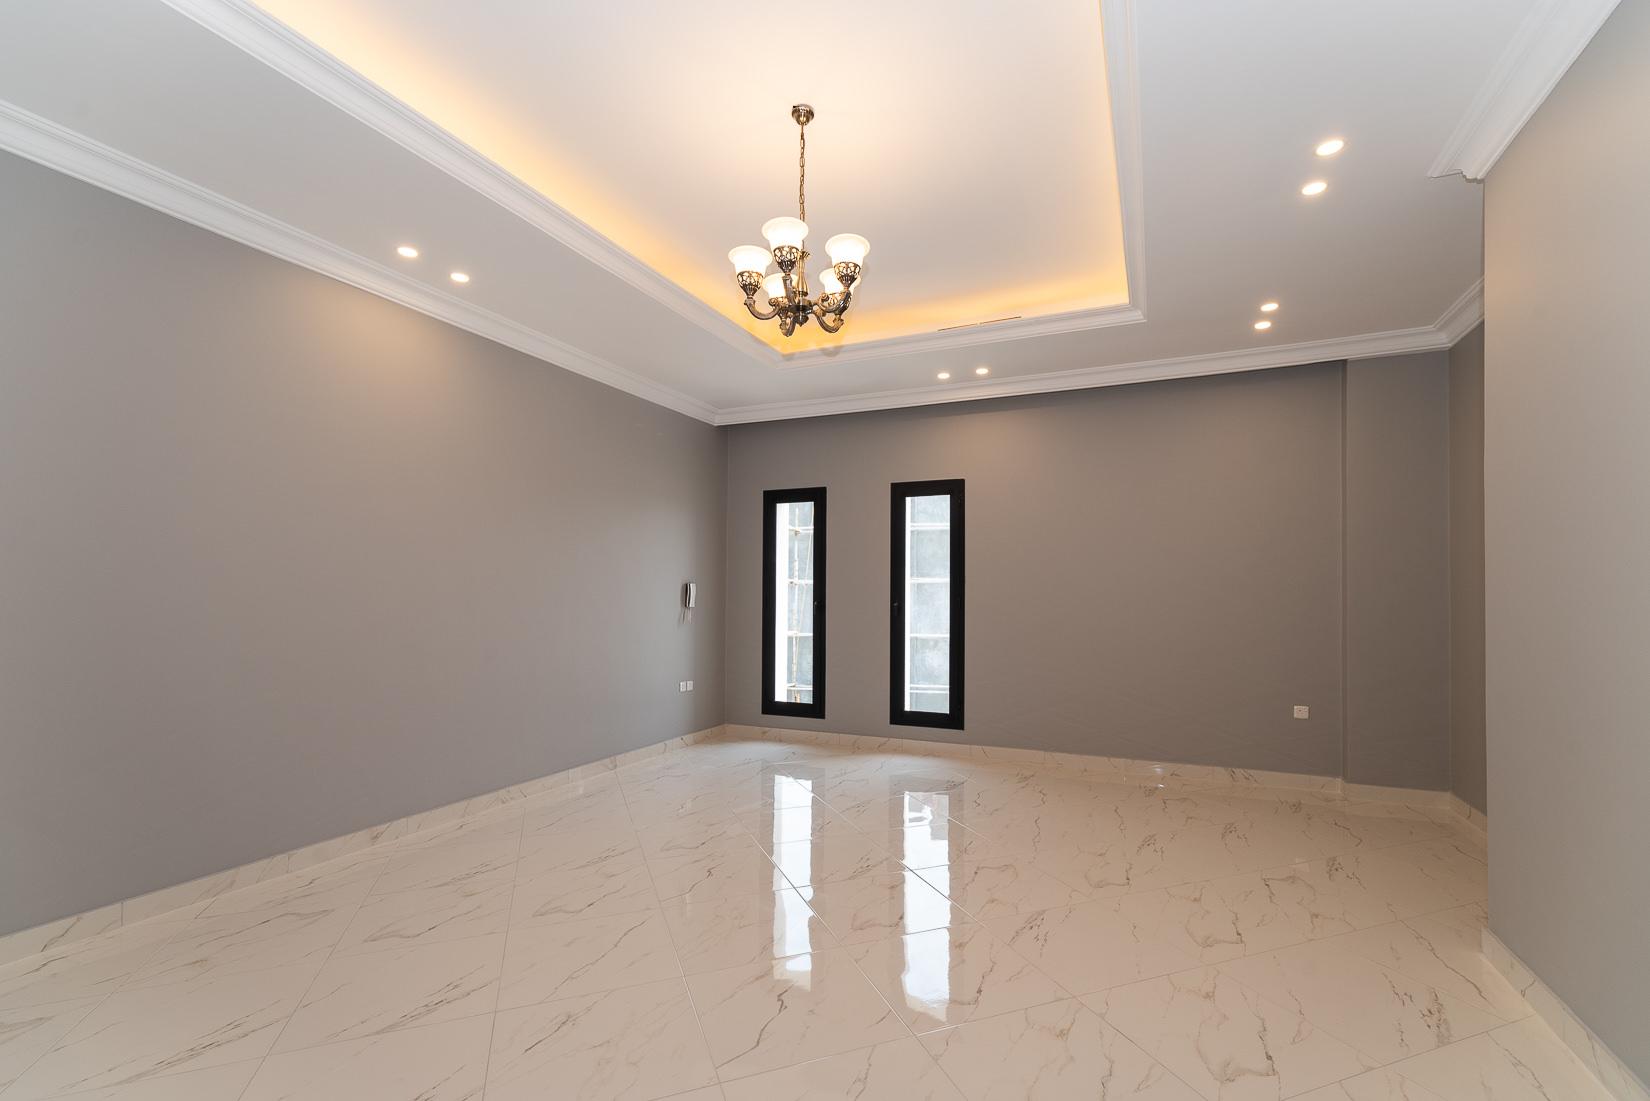 Fnaitees – spacious, unfurnished four bedroom floor